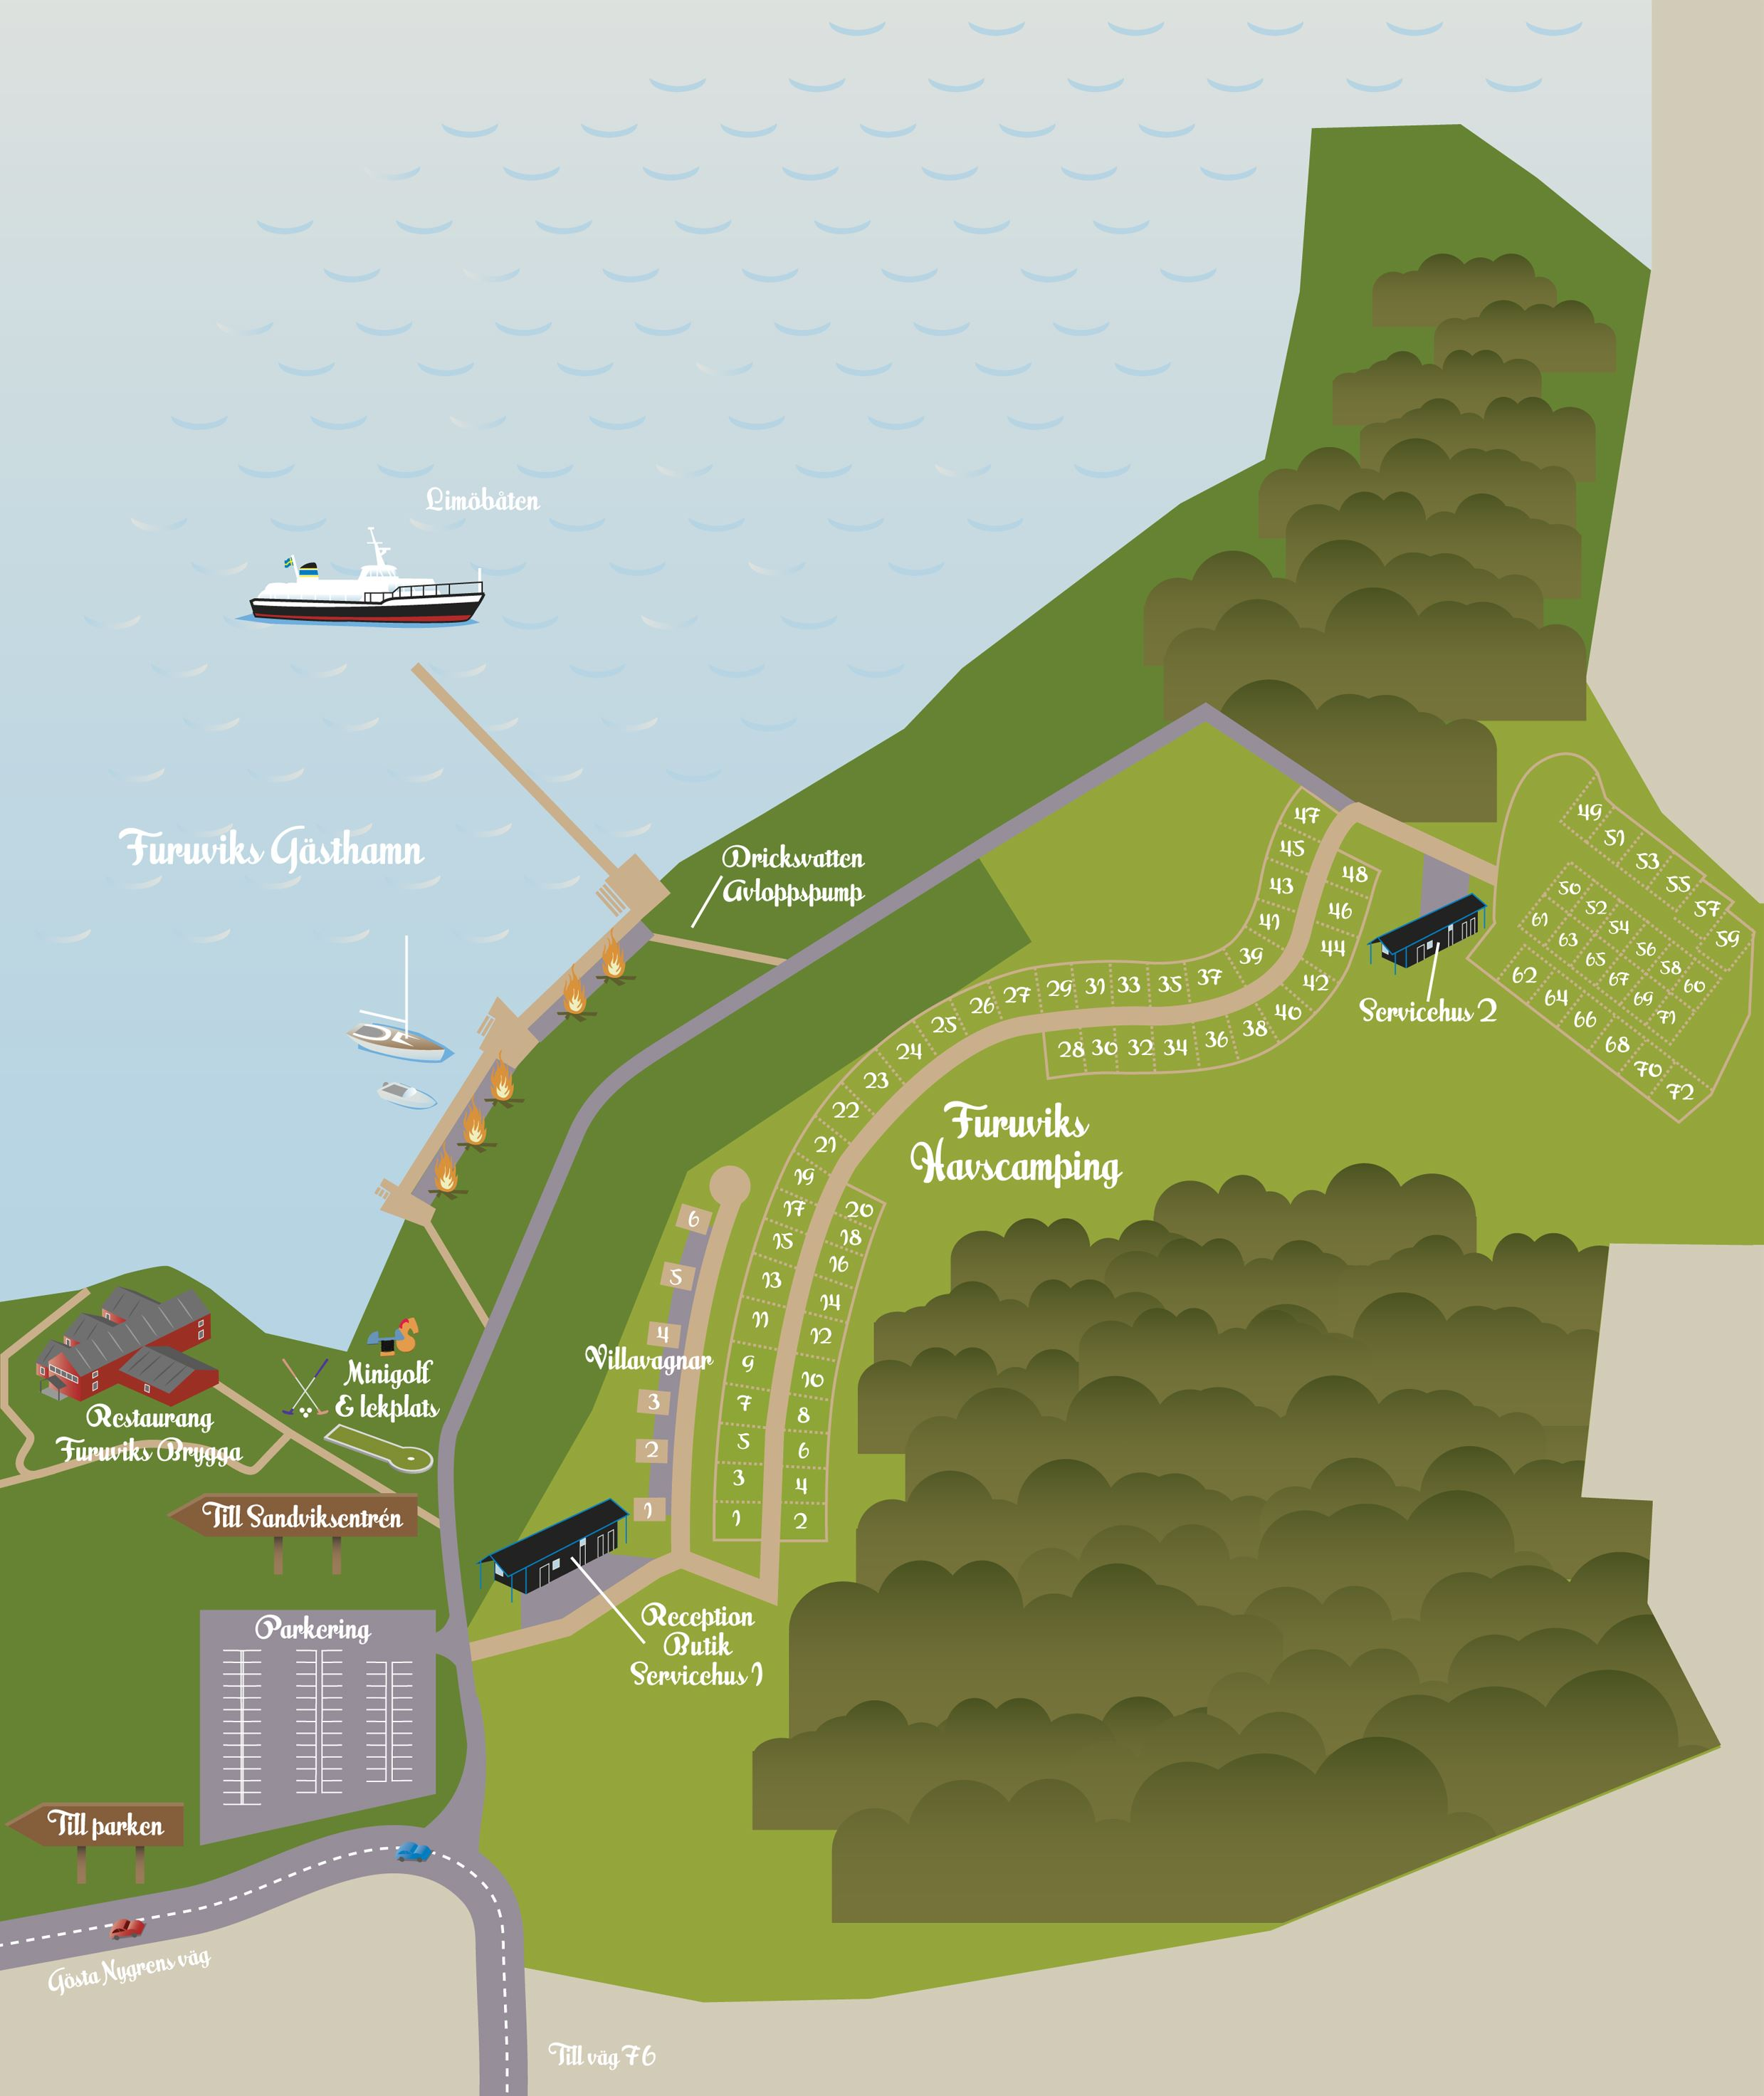 Furuvik's Sea Camping and Guest Marina